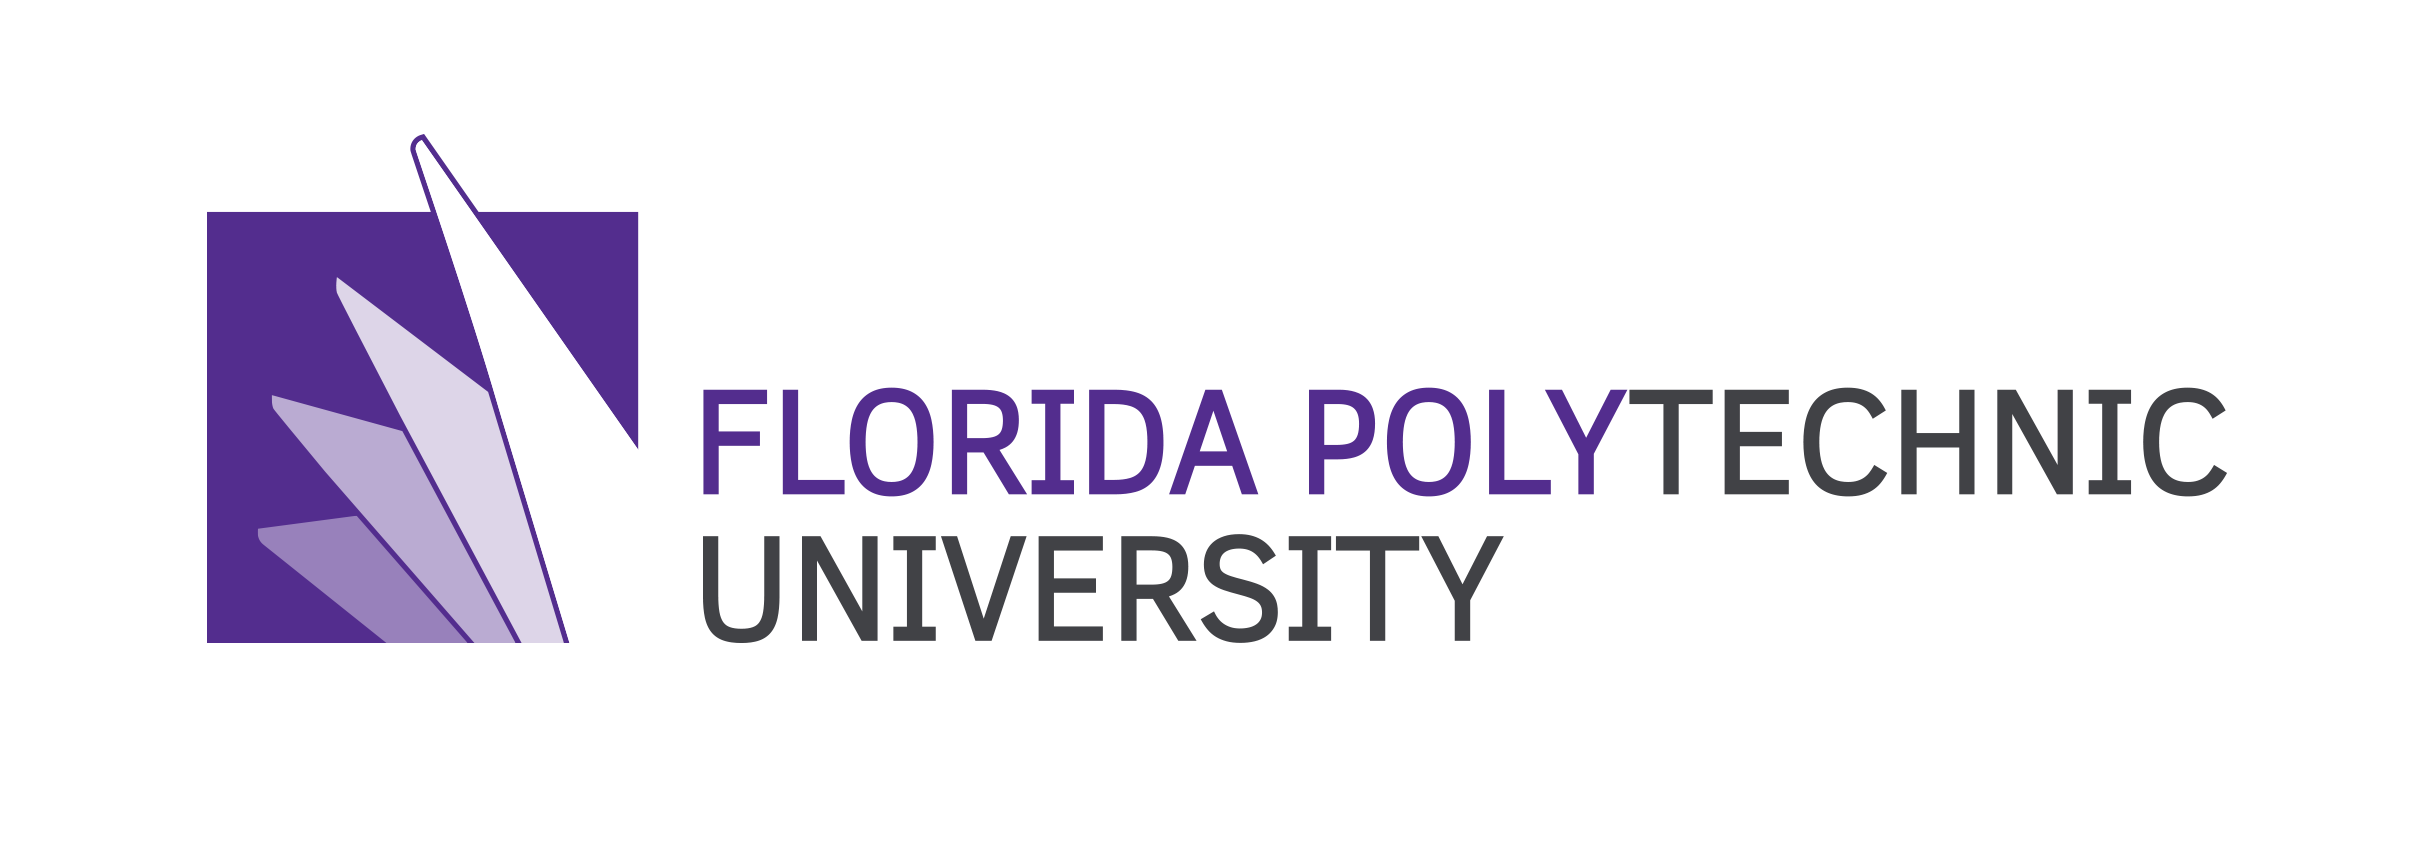 Florida Polytechnic University (FPU)